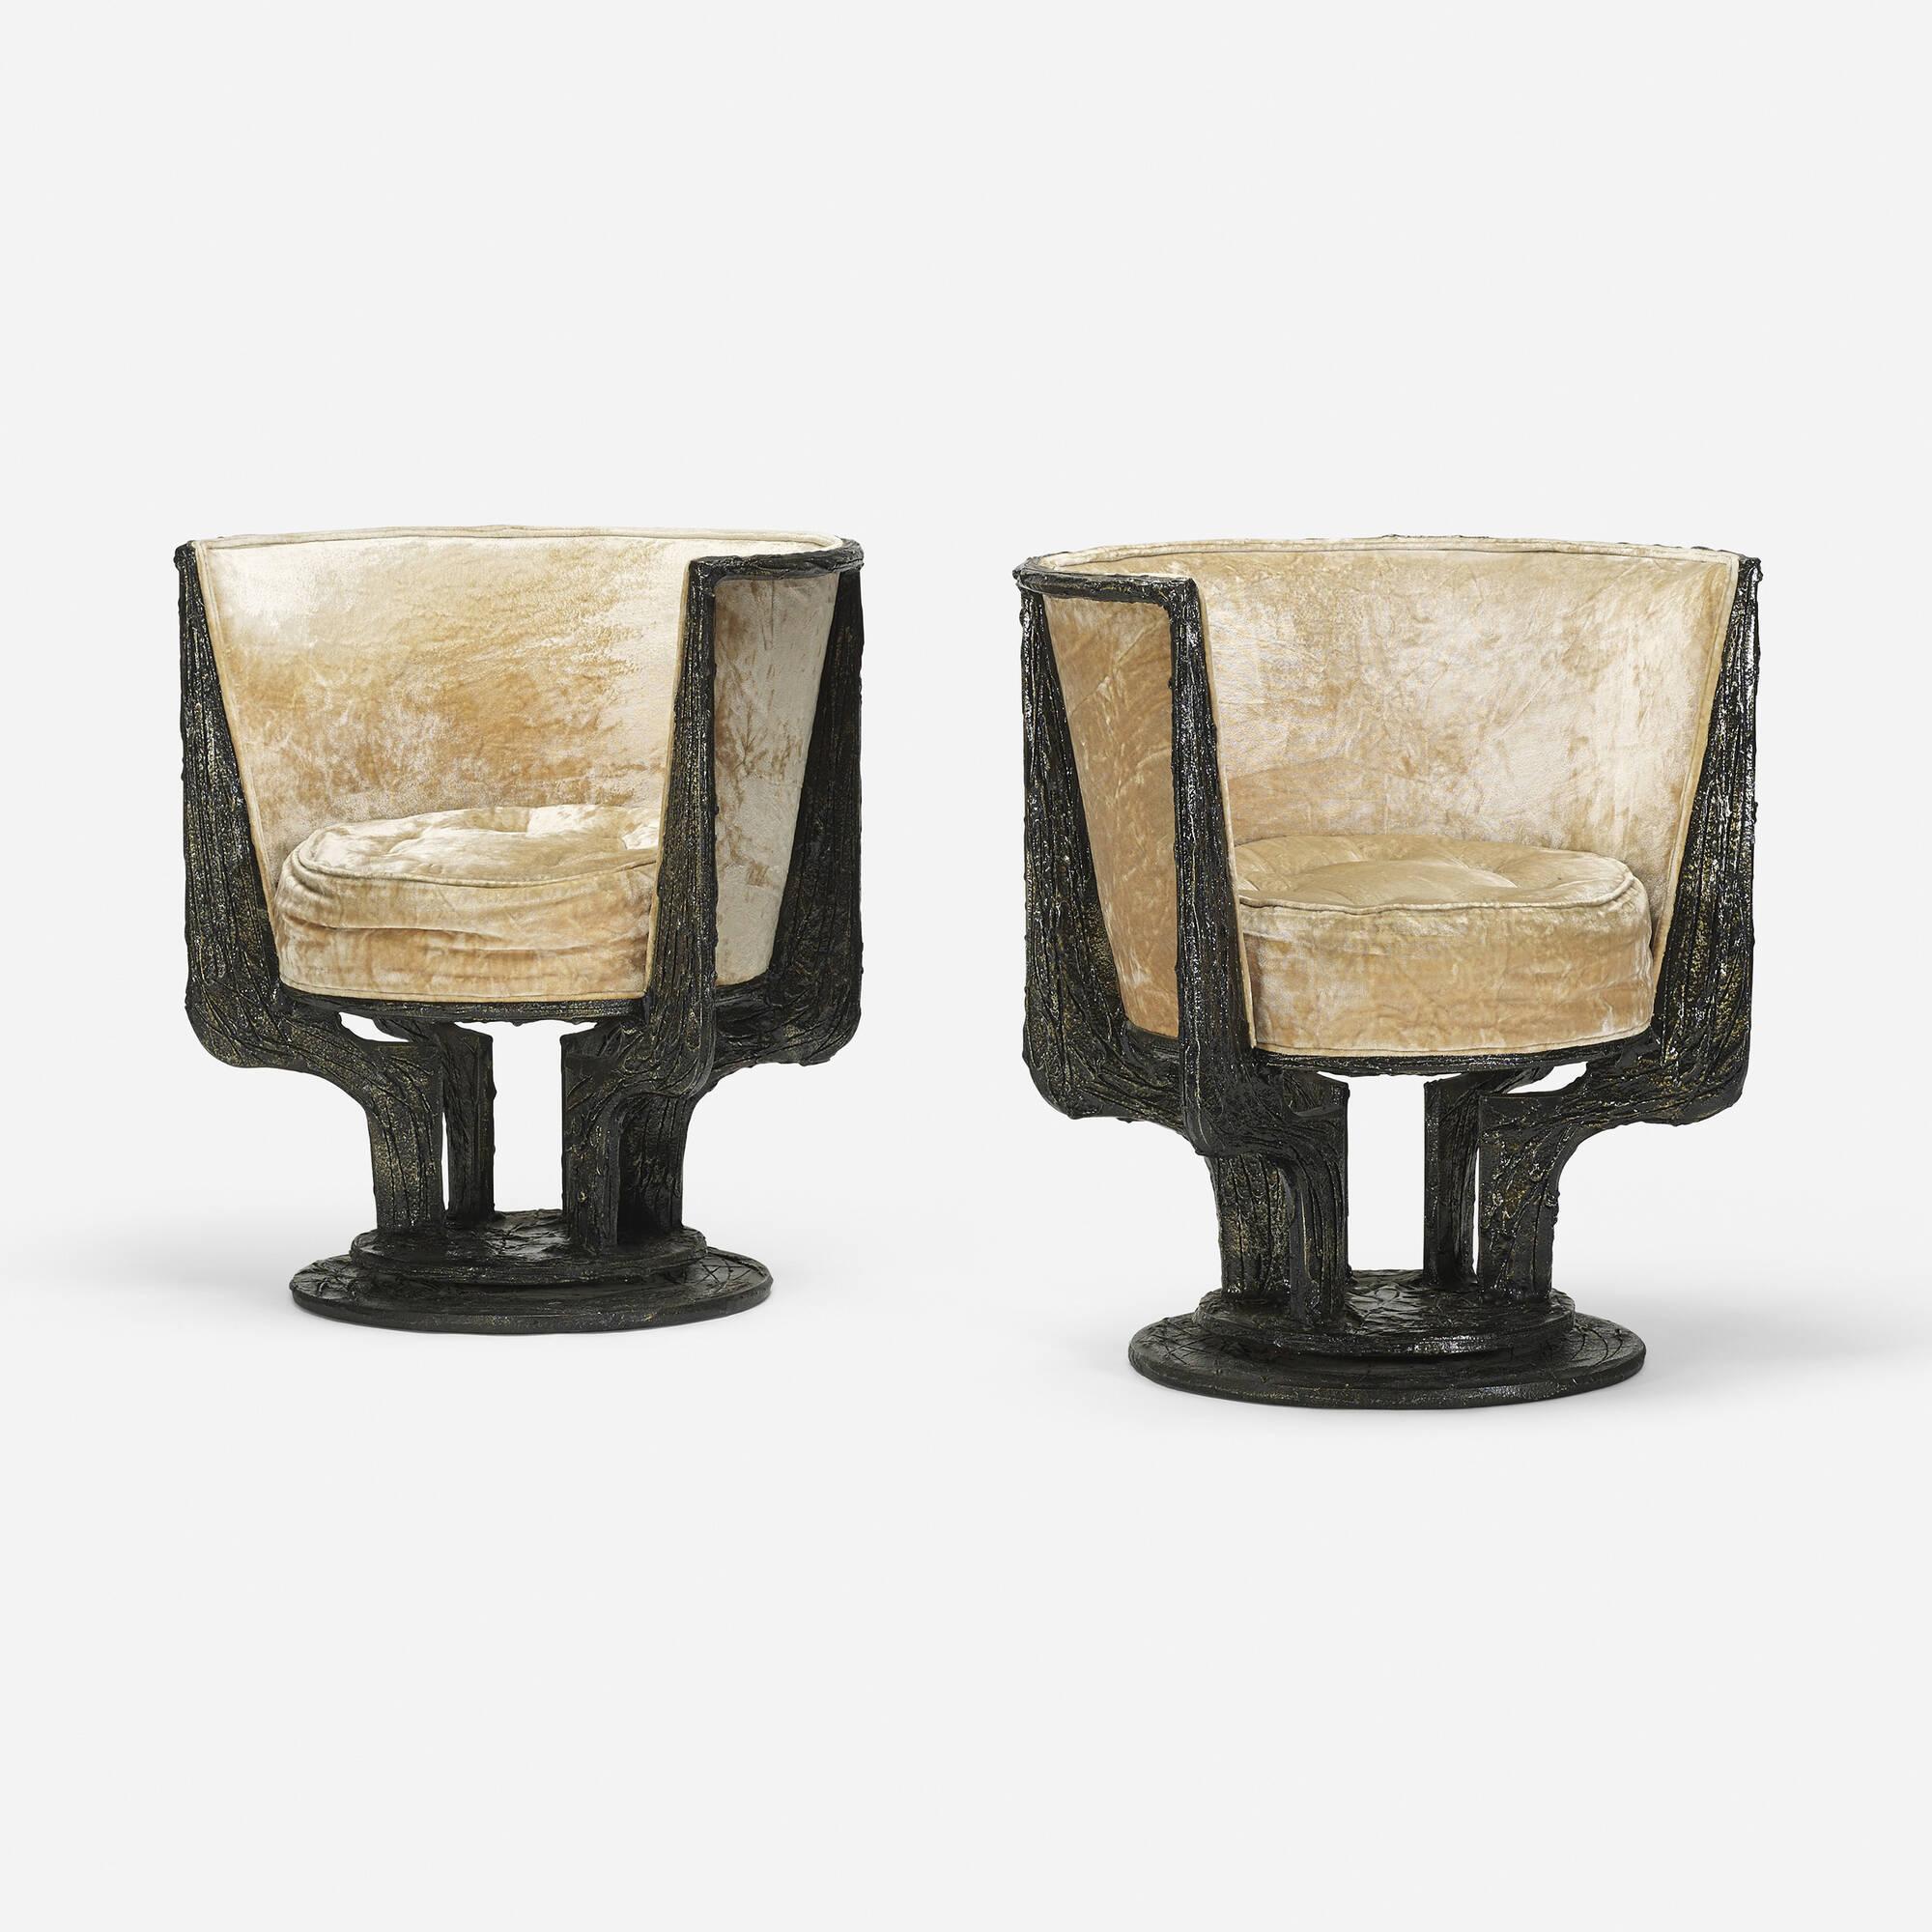 Delightful ... 233: Paul Evans / Sculpted Metal Lounge Chairs Model PE 141, Pair (